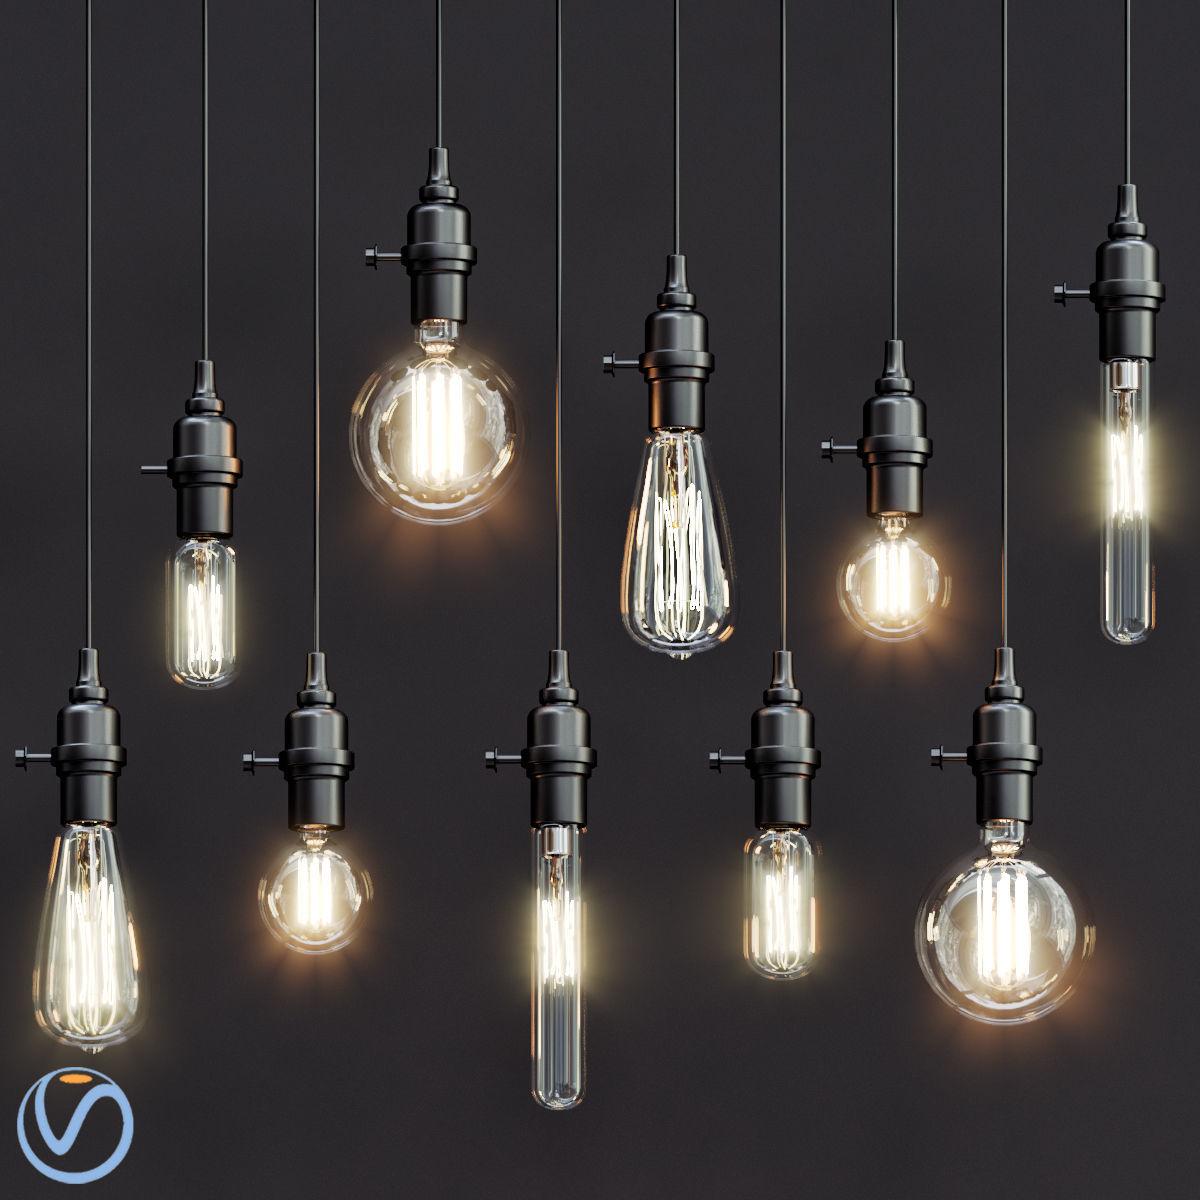 Vintage Style Pendant Lights Model